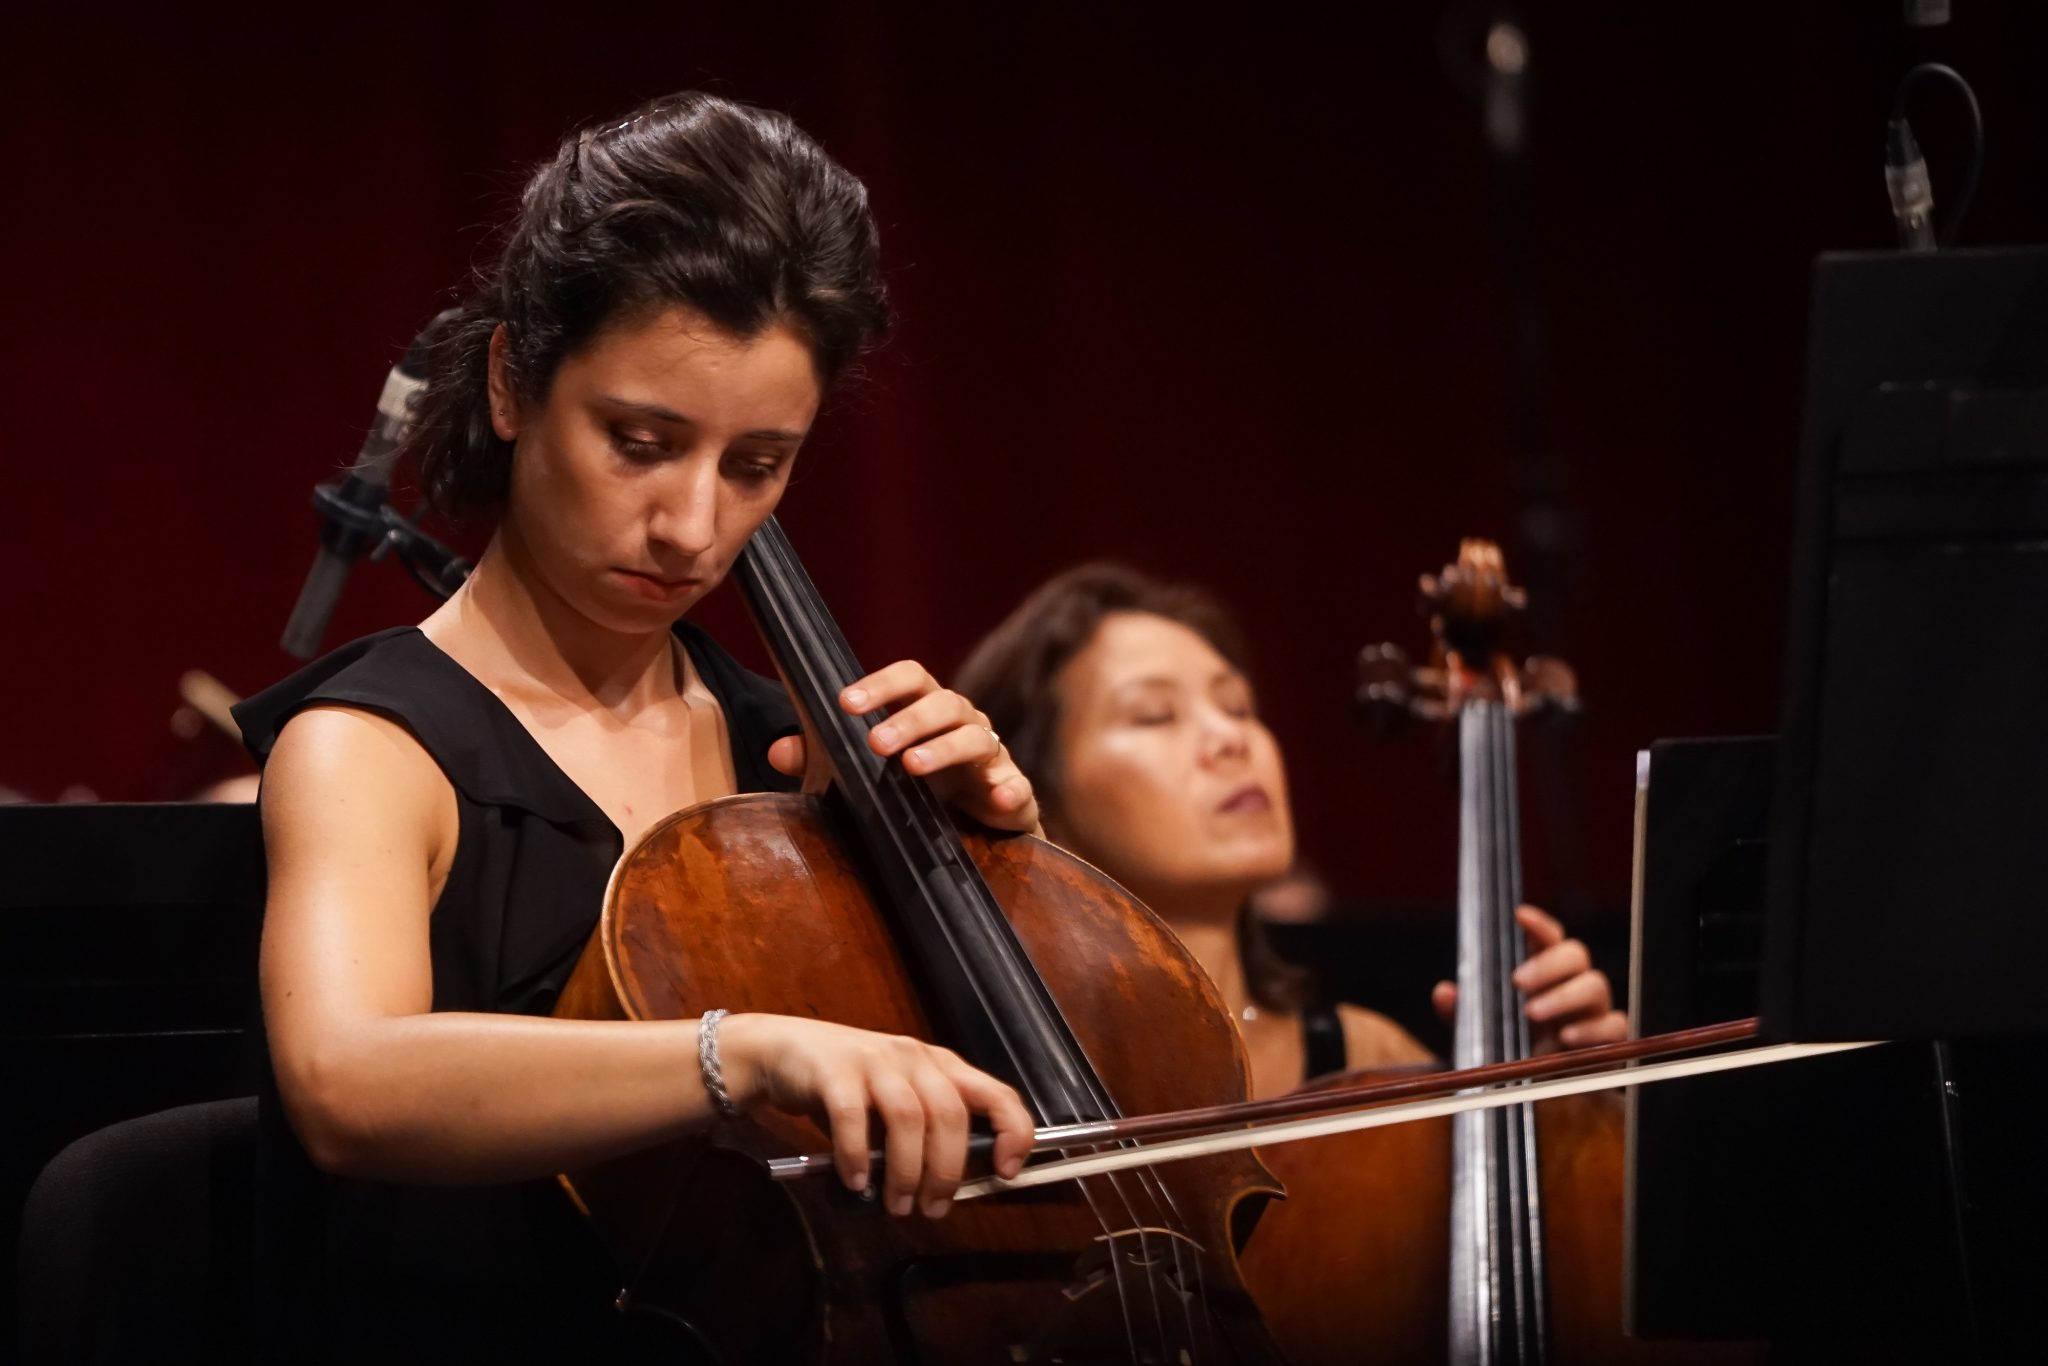 Mulher a tocar violoncelo